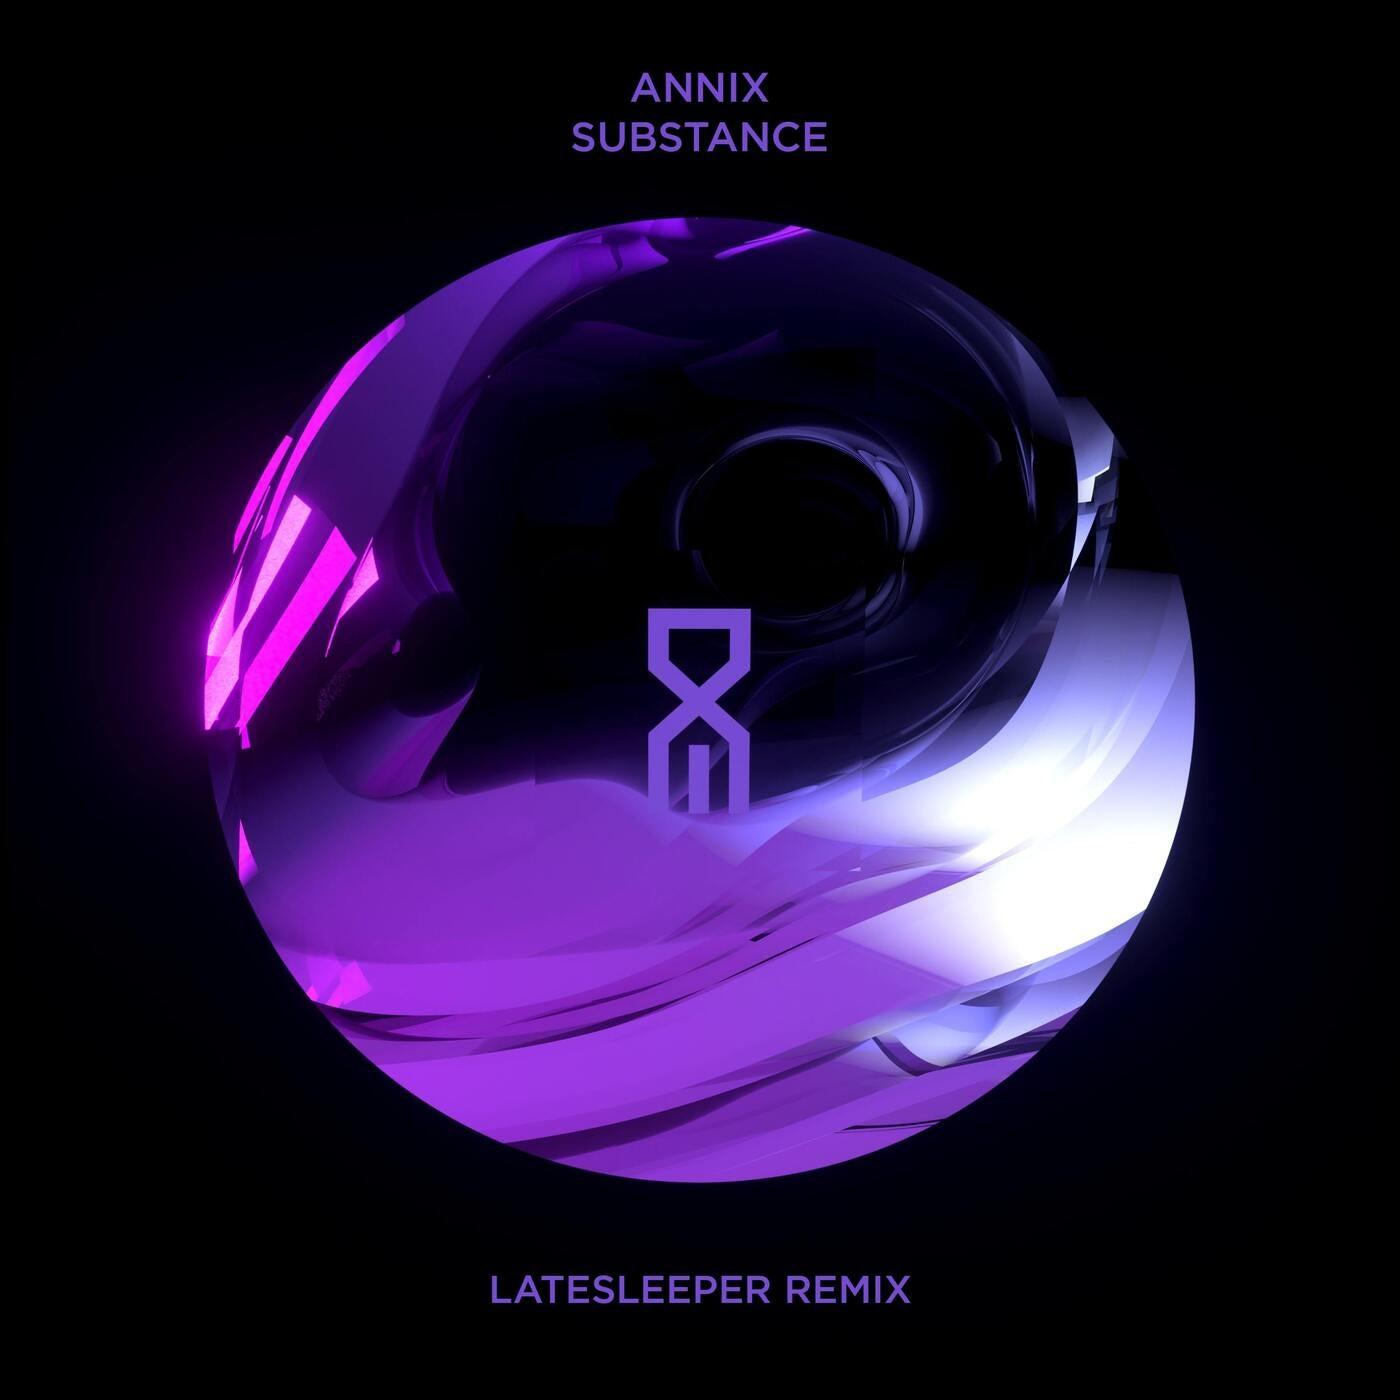 Substance (latesleeper Remix)